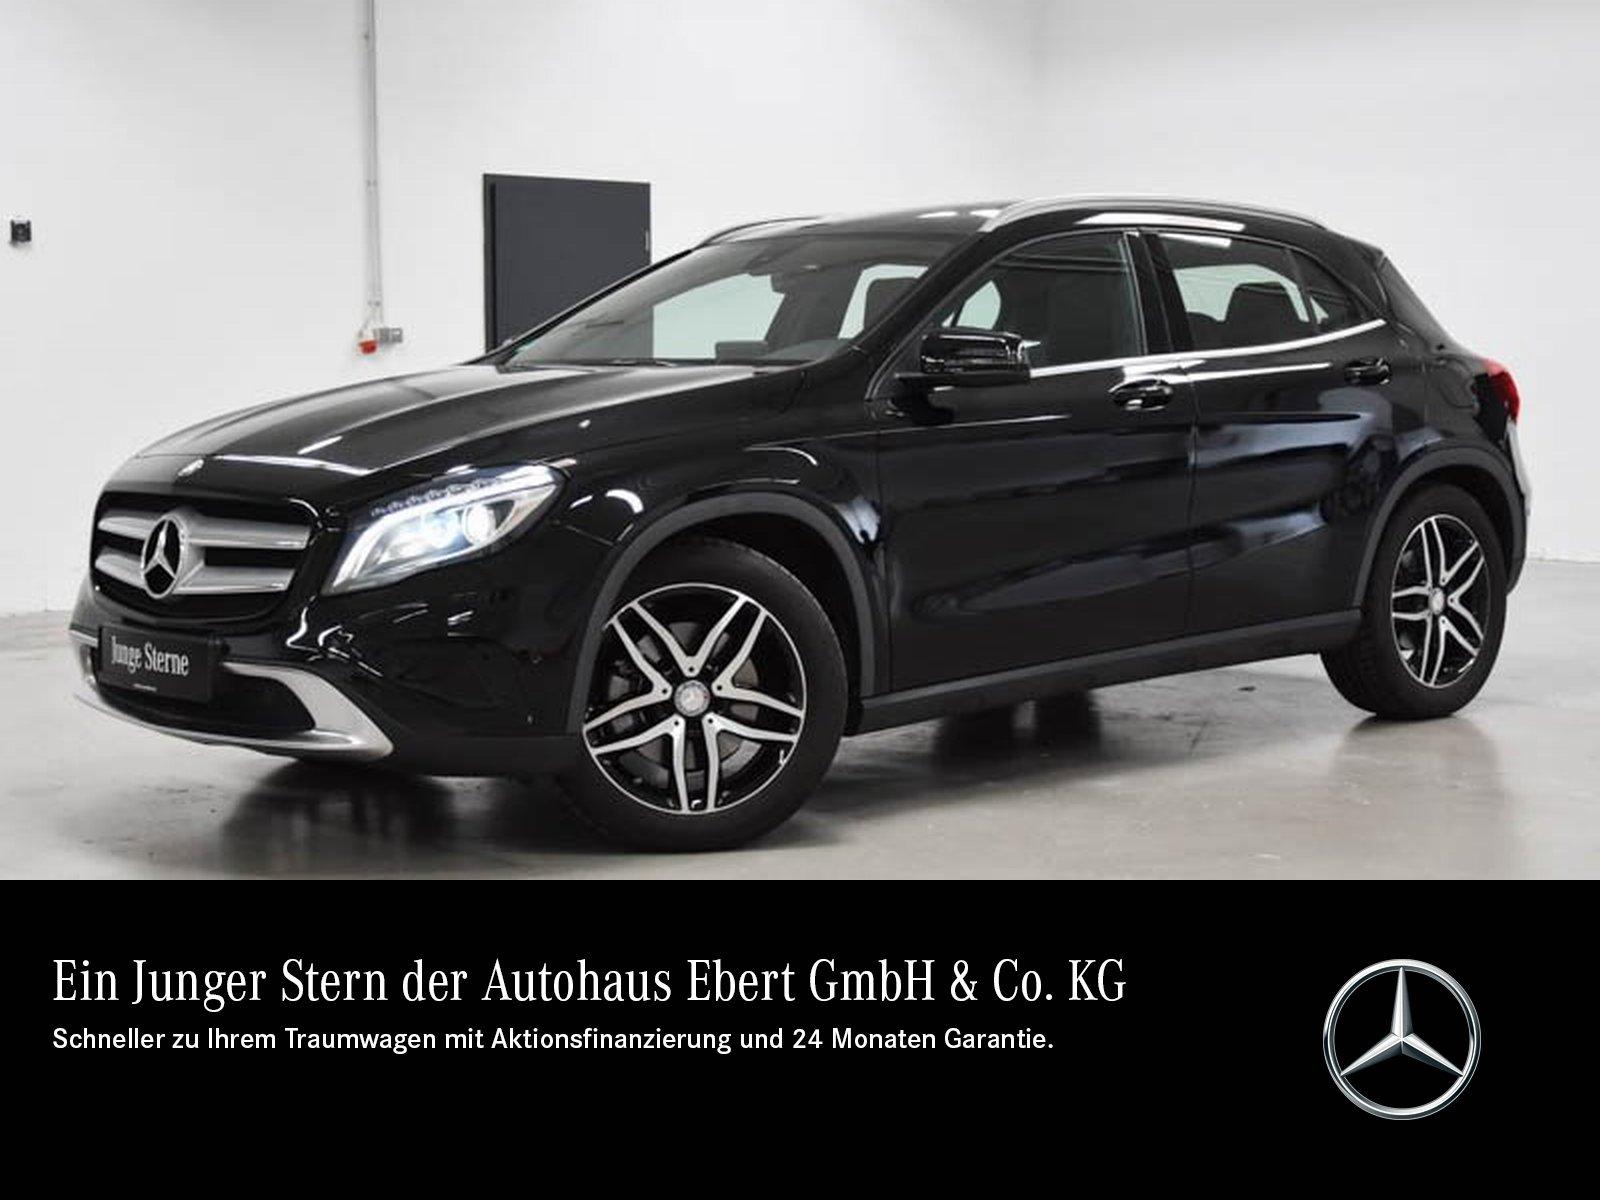 Mercedes-Benz GLA 250 Urban 7G+NAVI+PSD+RKF+BI-XENON+EASY-PACK, Jahr 2016, Benzin